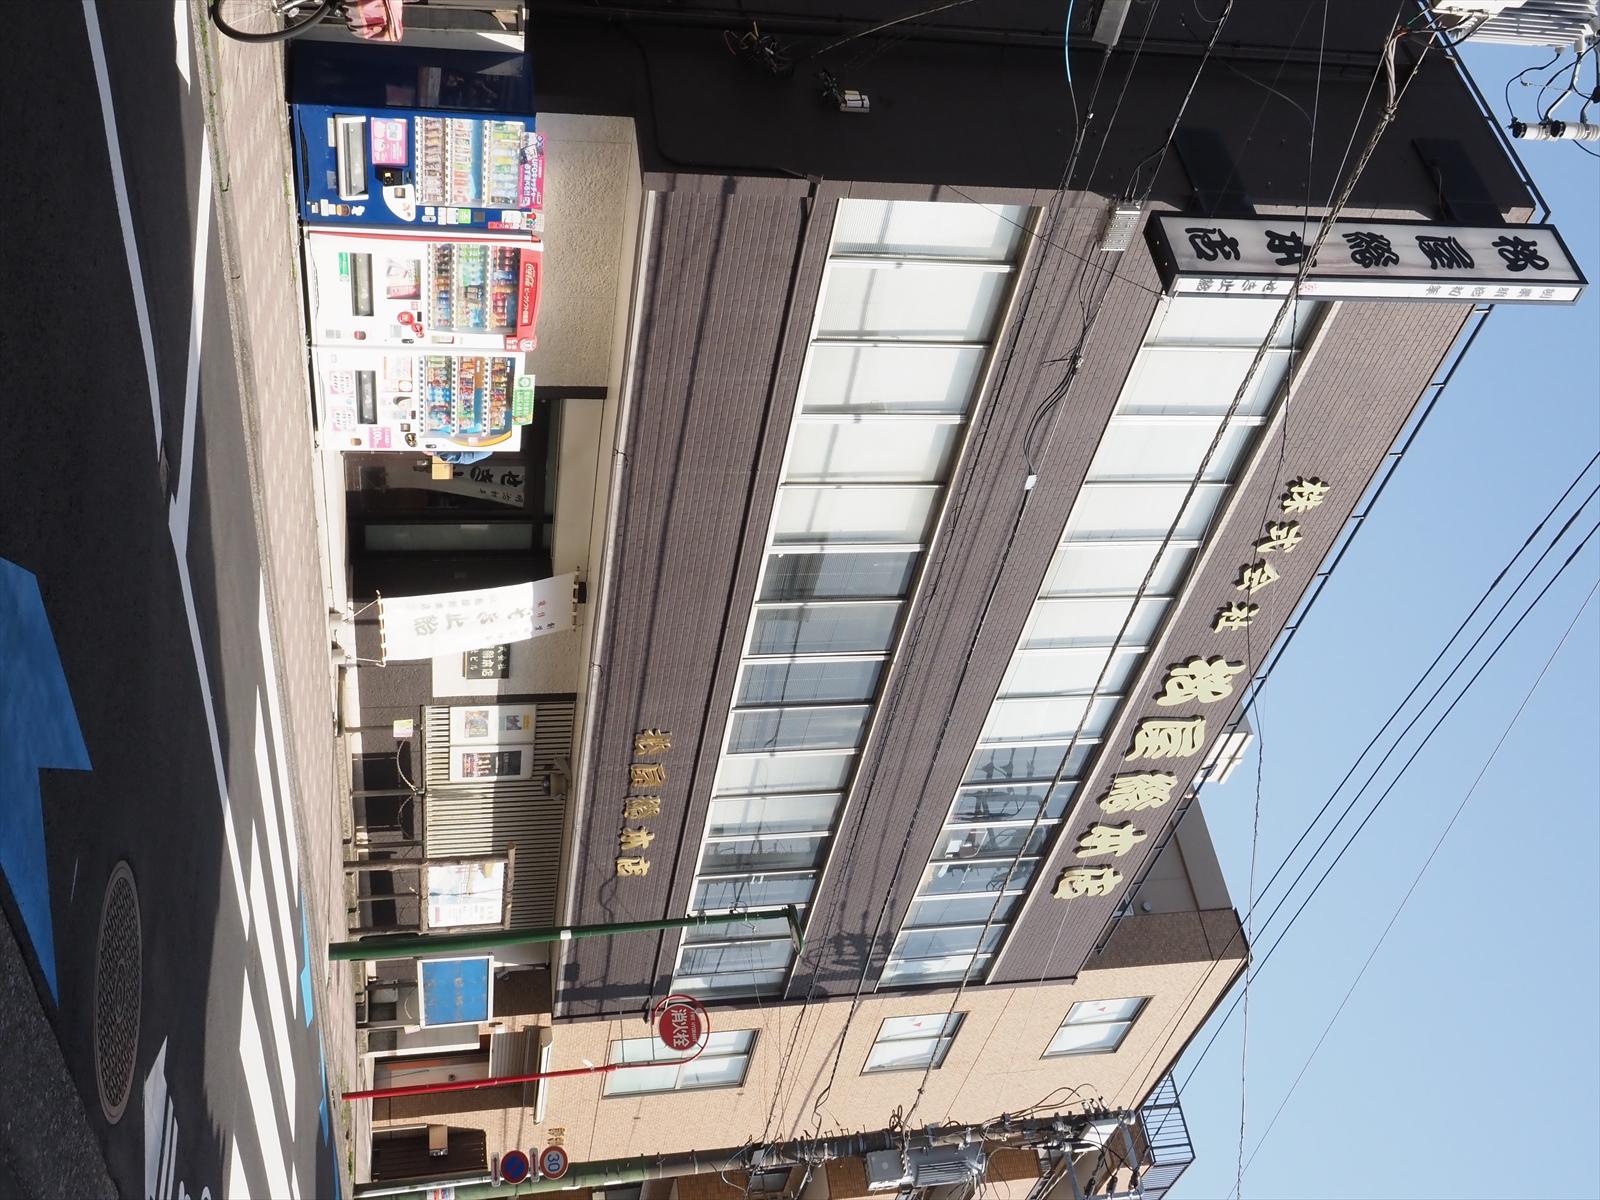 株式会社 松屋総本店本社ビル